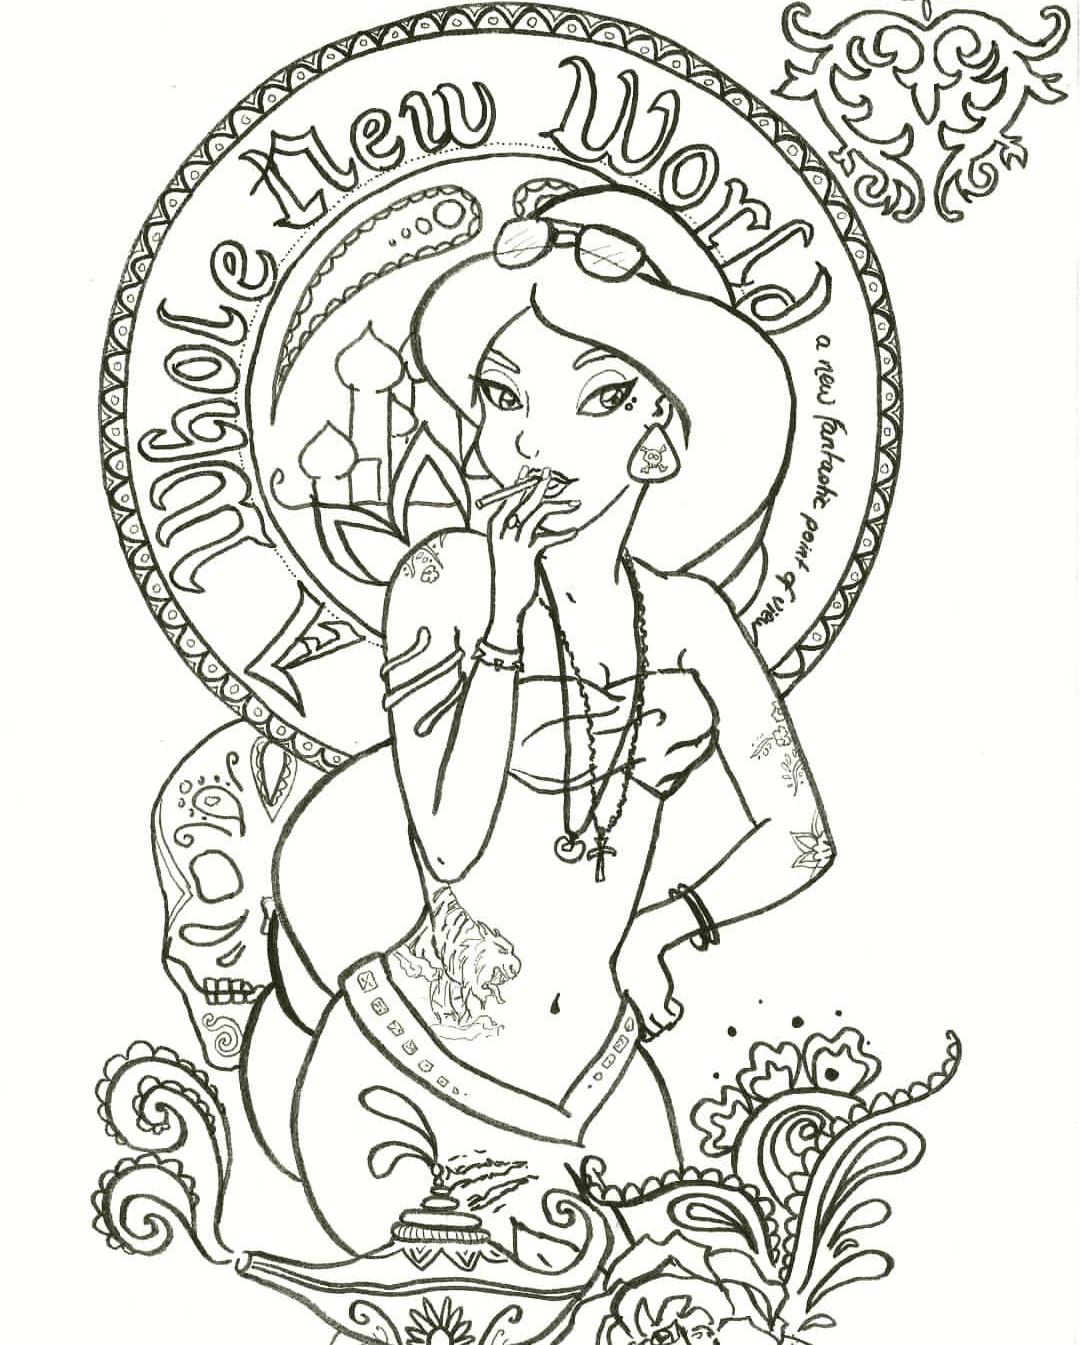 Pin By Verspultesprinzesschen On Disney Punk Aladdin Jasmine Disney Princess Coloring Pages Princess Coloring Pages Disney Coloring Pages